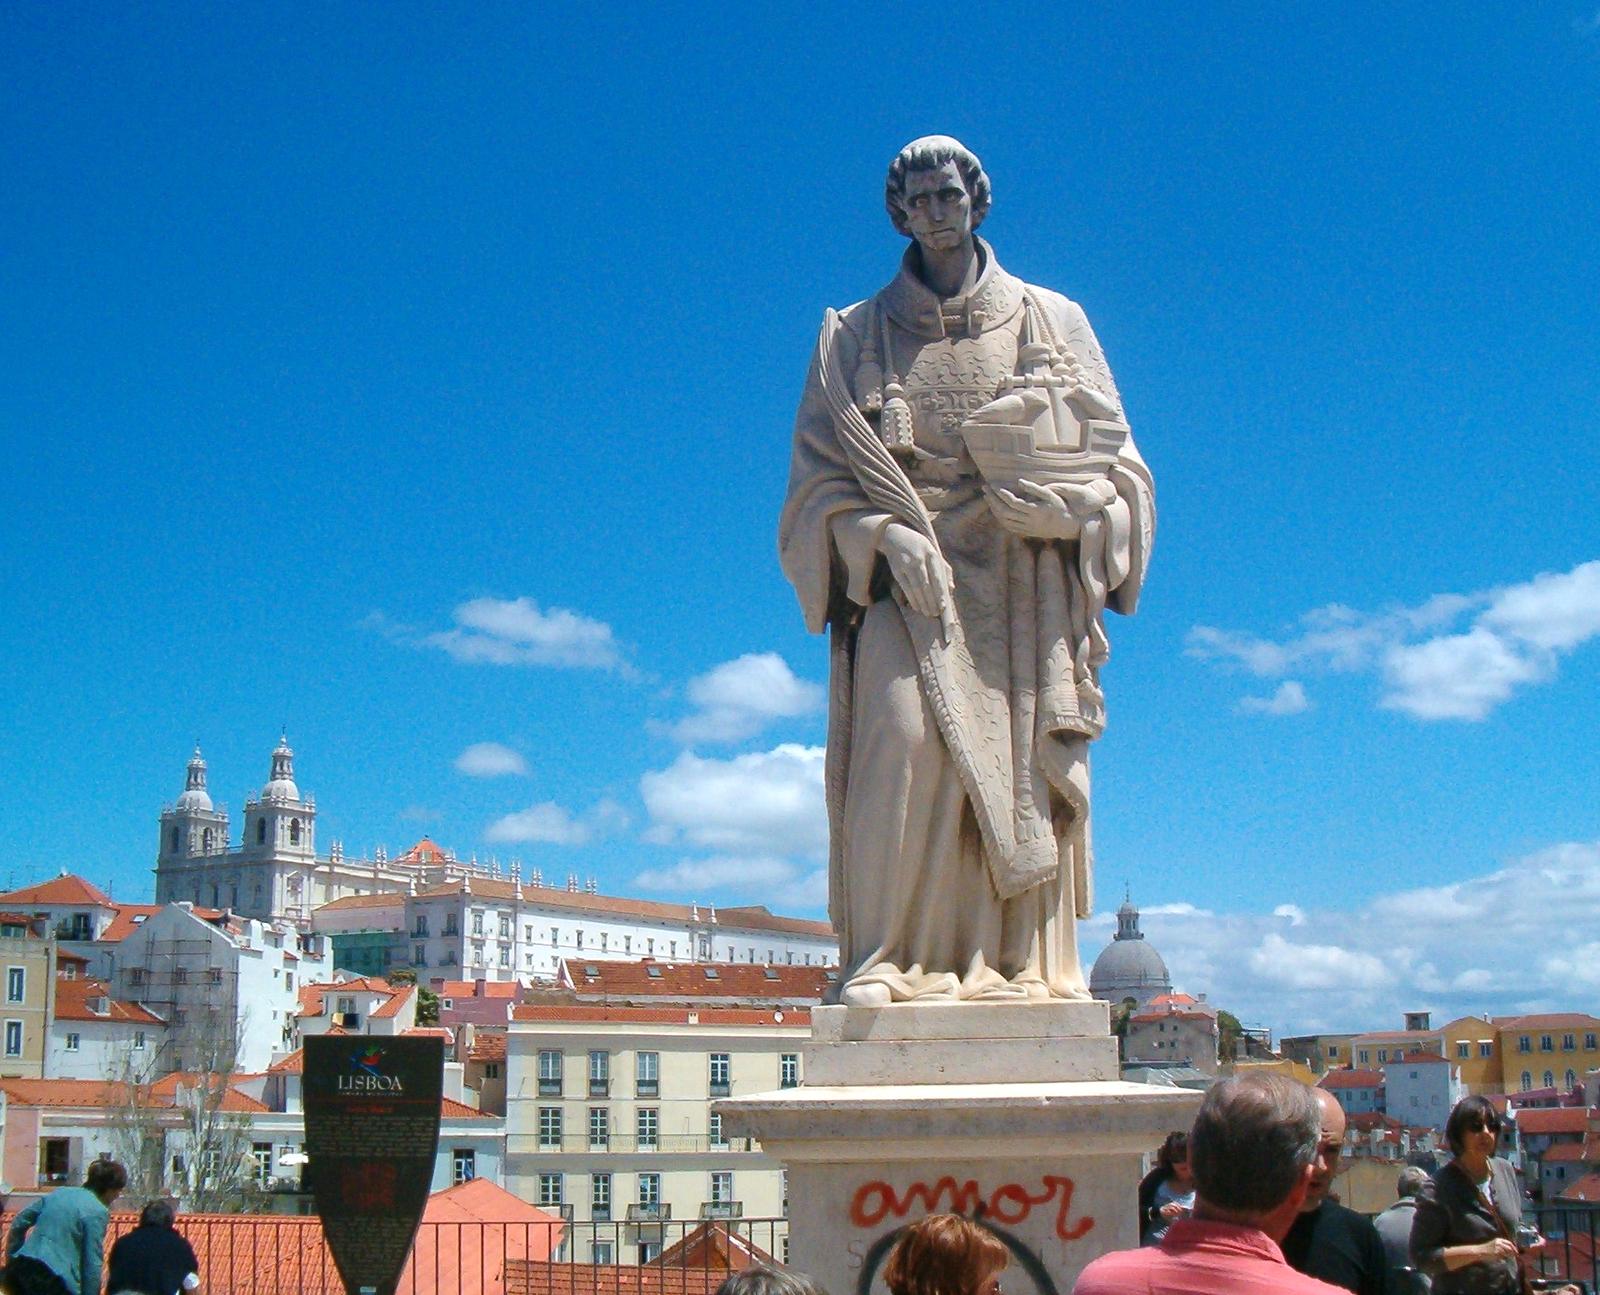 File:Lisbon, statue of Saint Vincent.jpg - Wikimedia Commons